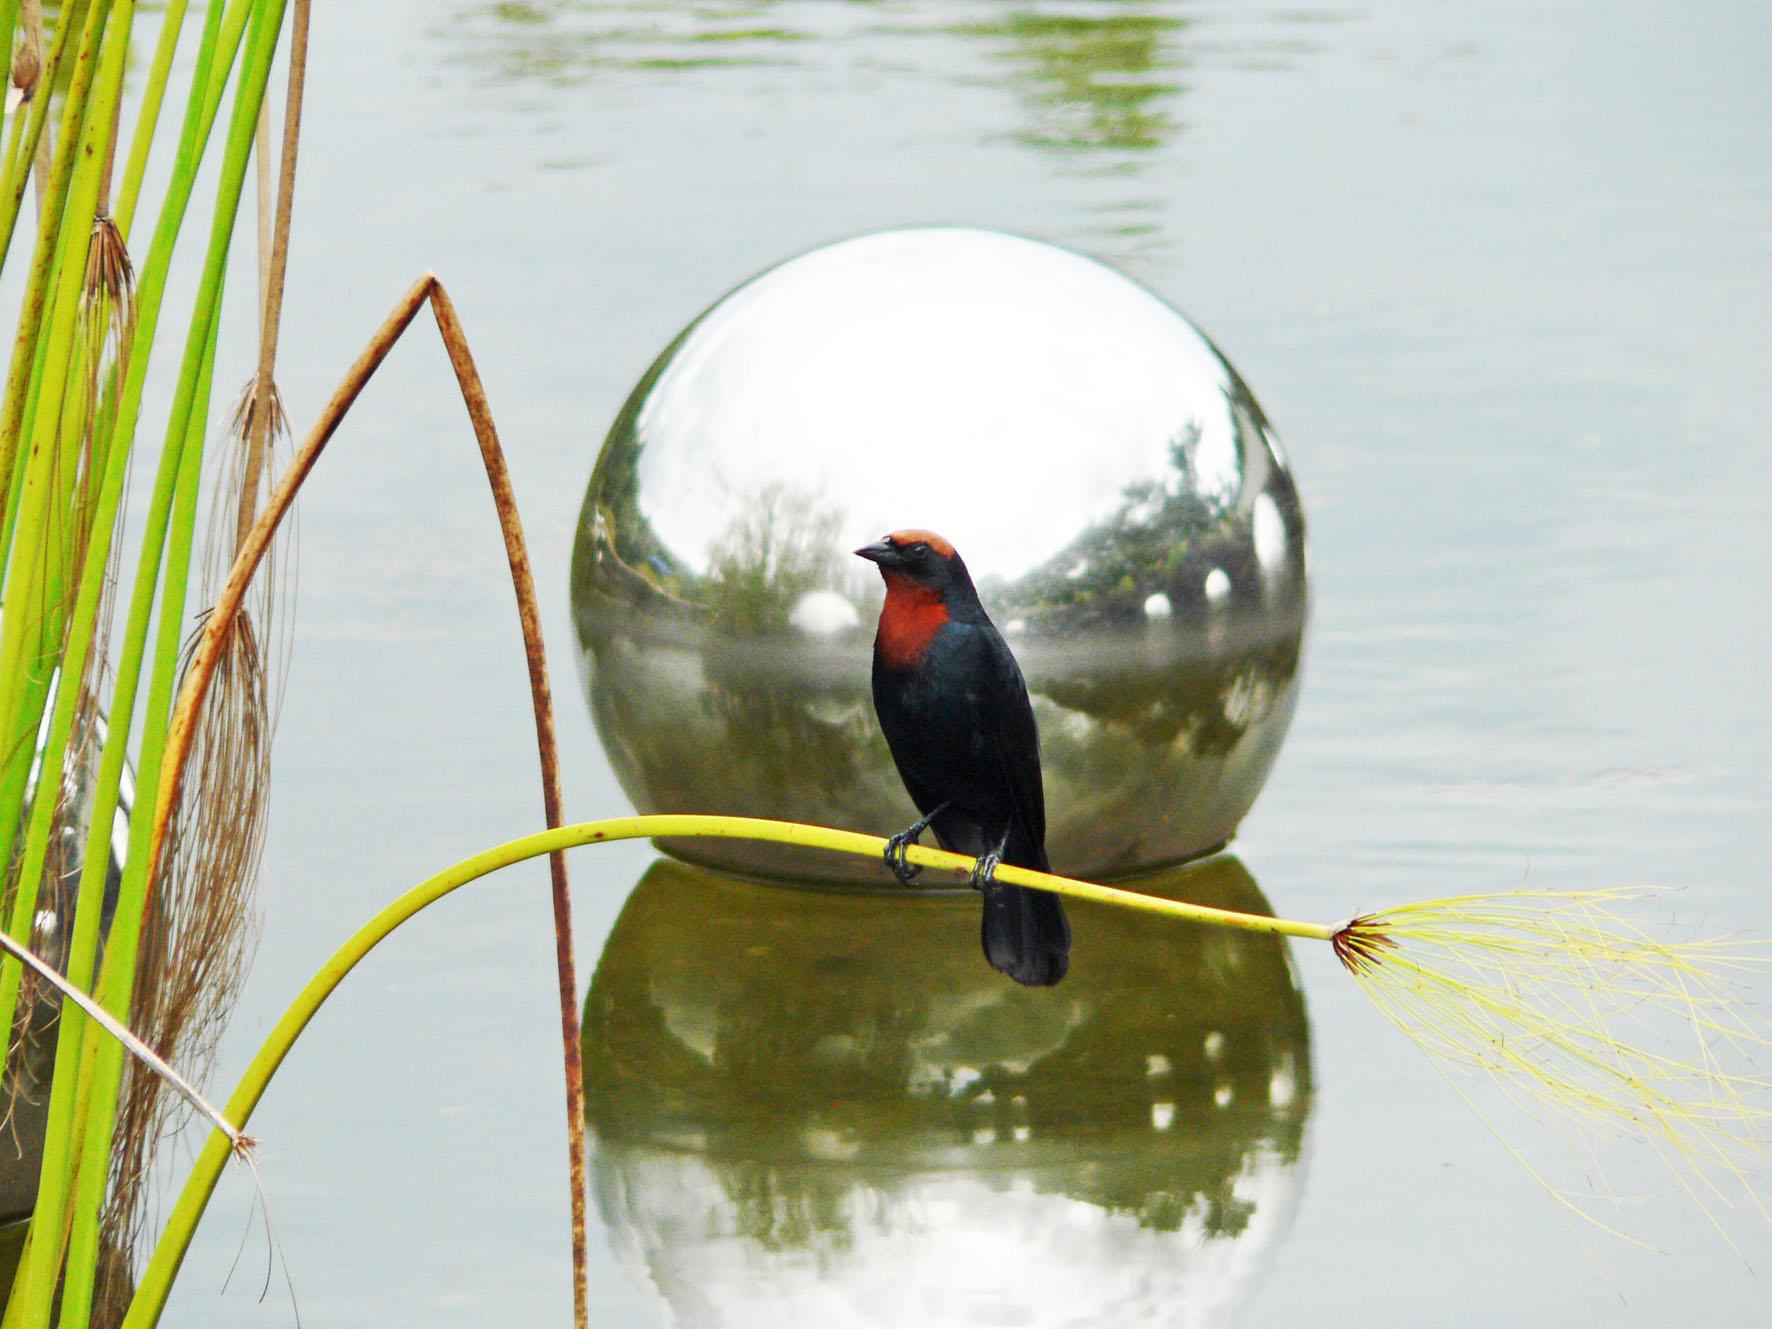 Foto vogel op rietstengel voor glimmende, drijvende bol